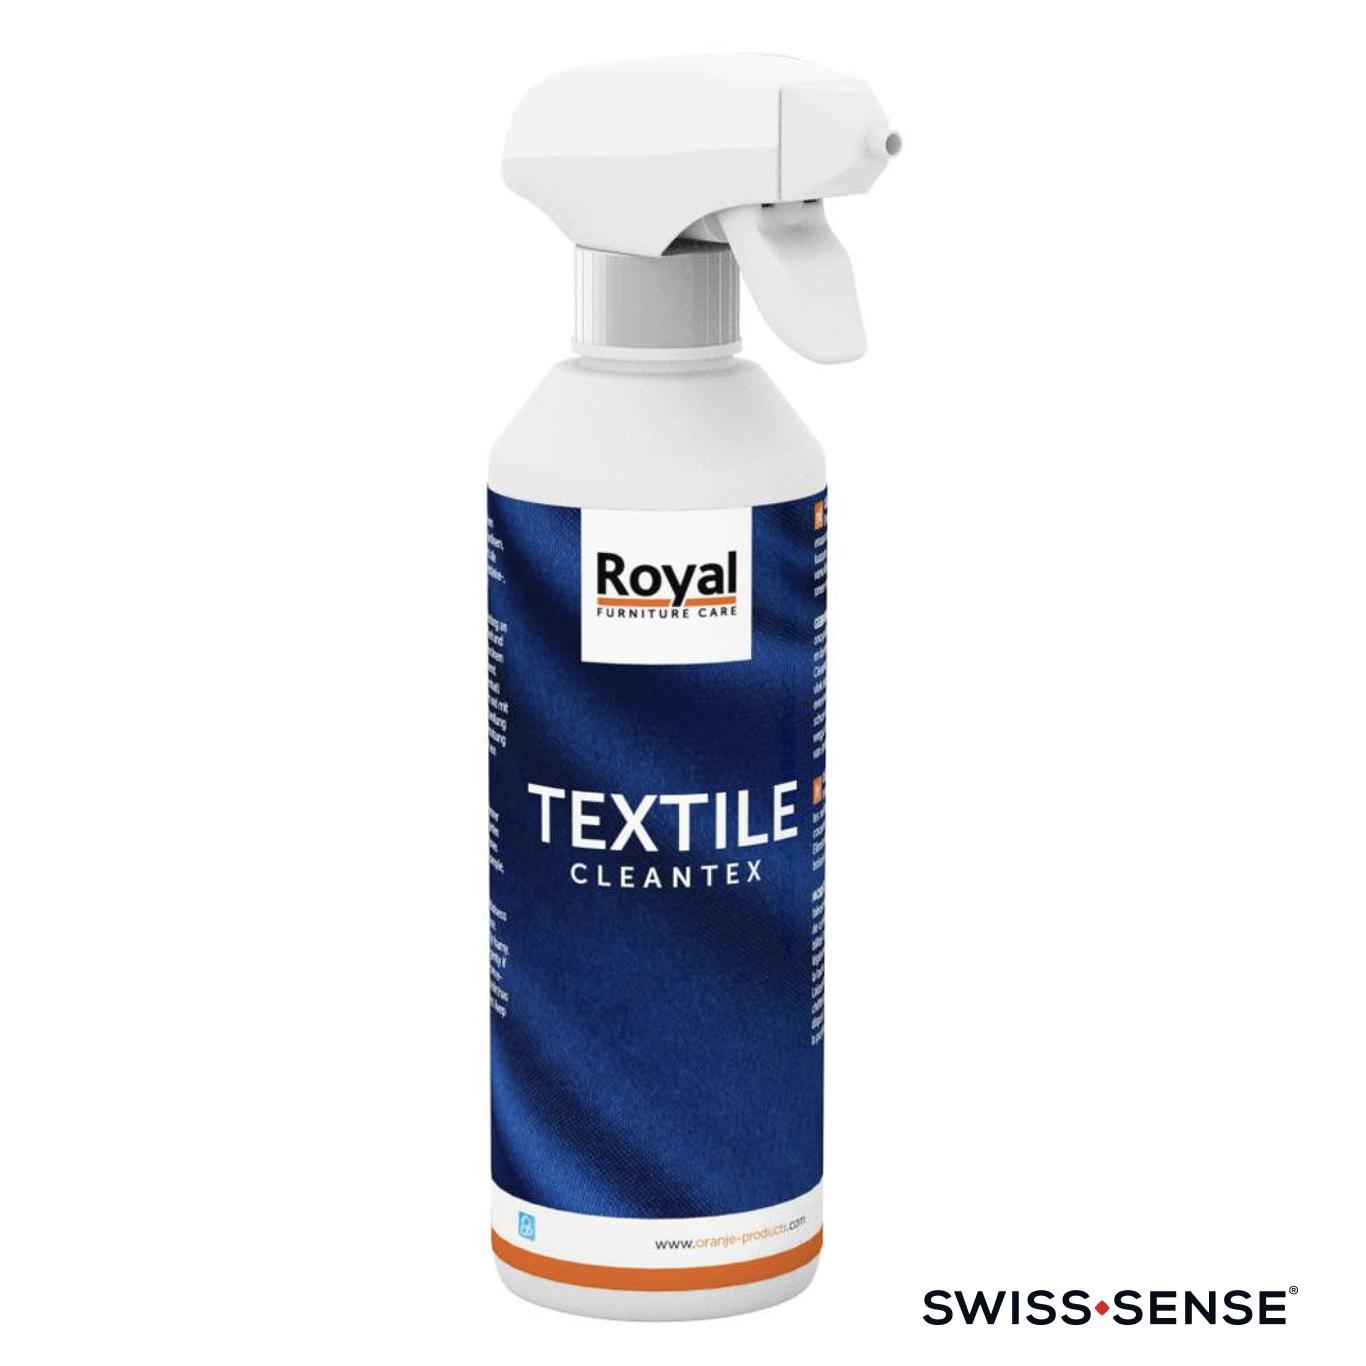 Textile Cleantex | Swiss Sense